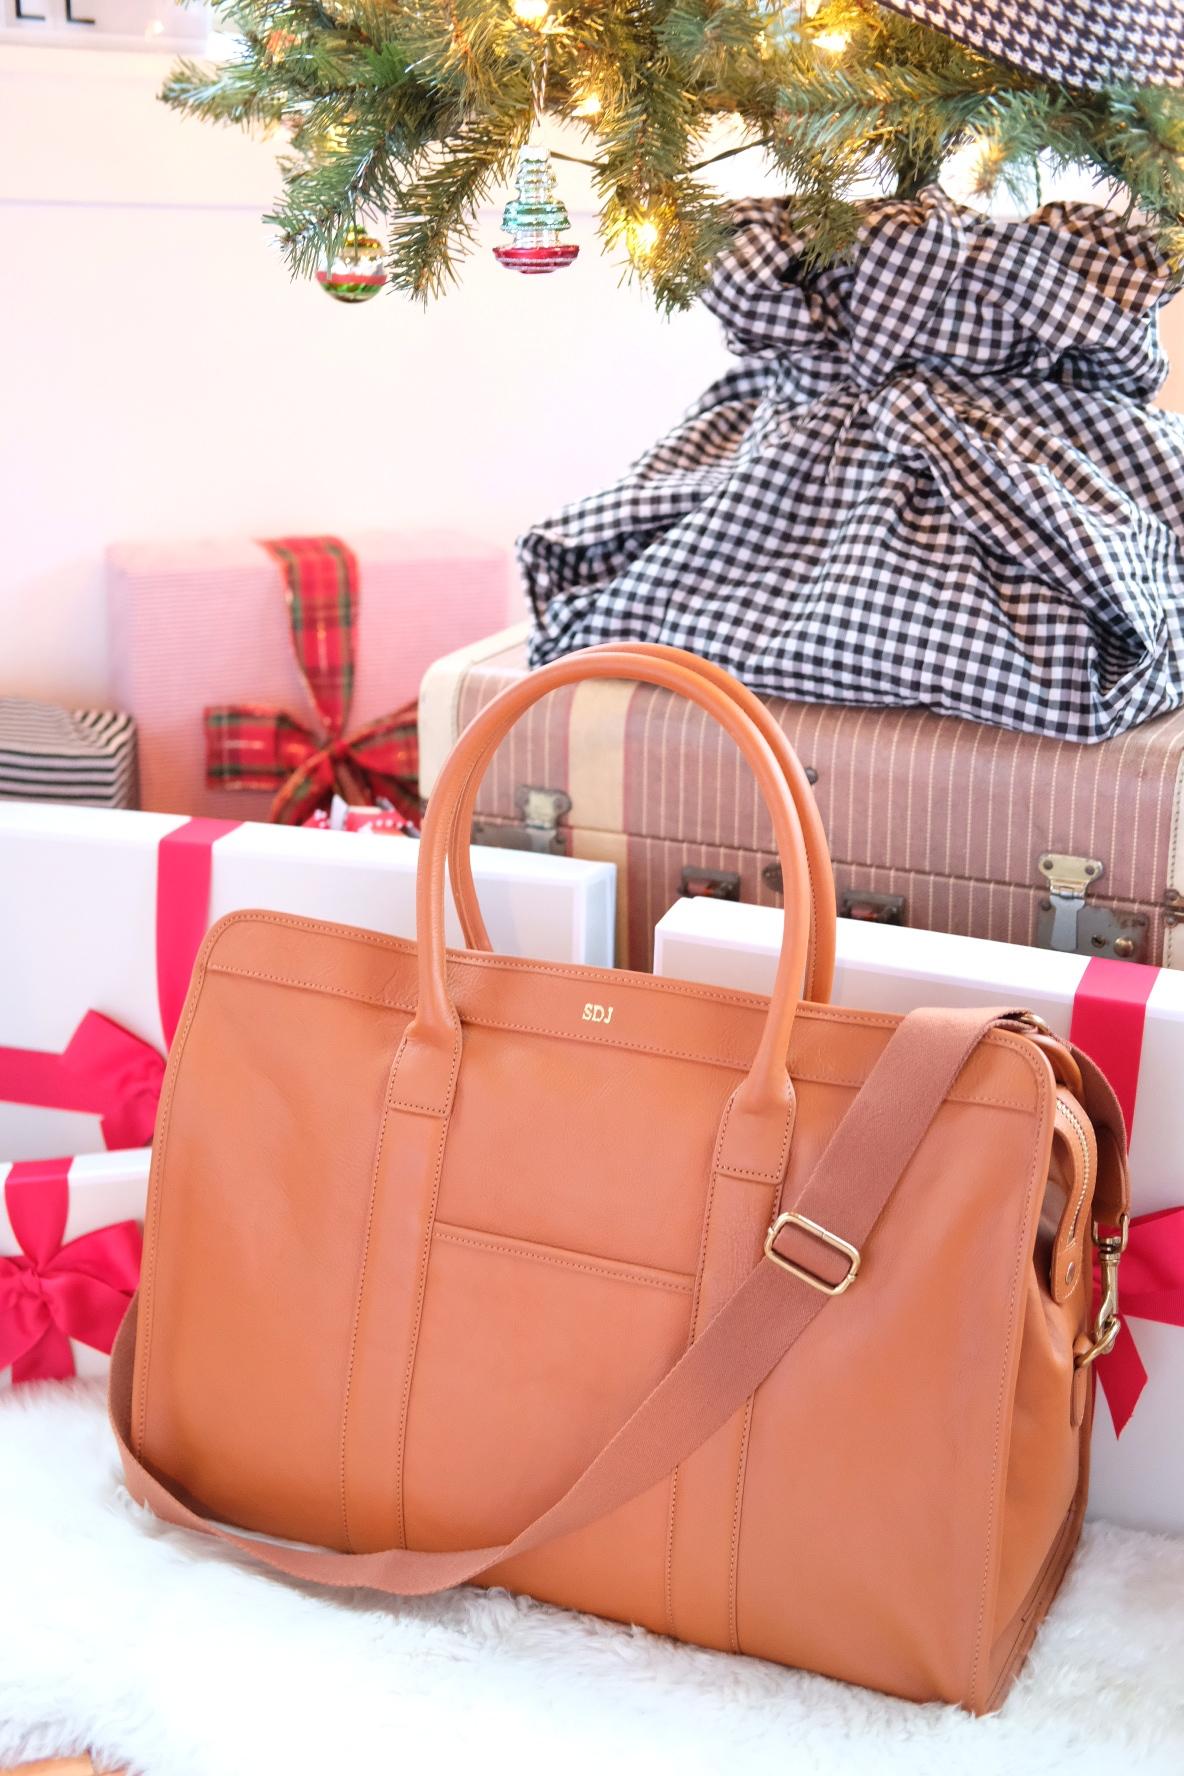 Mark & Graham Weekender Bag, Leather Weekend Bag for Men, Personalized Gifts for Him